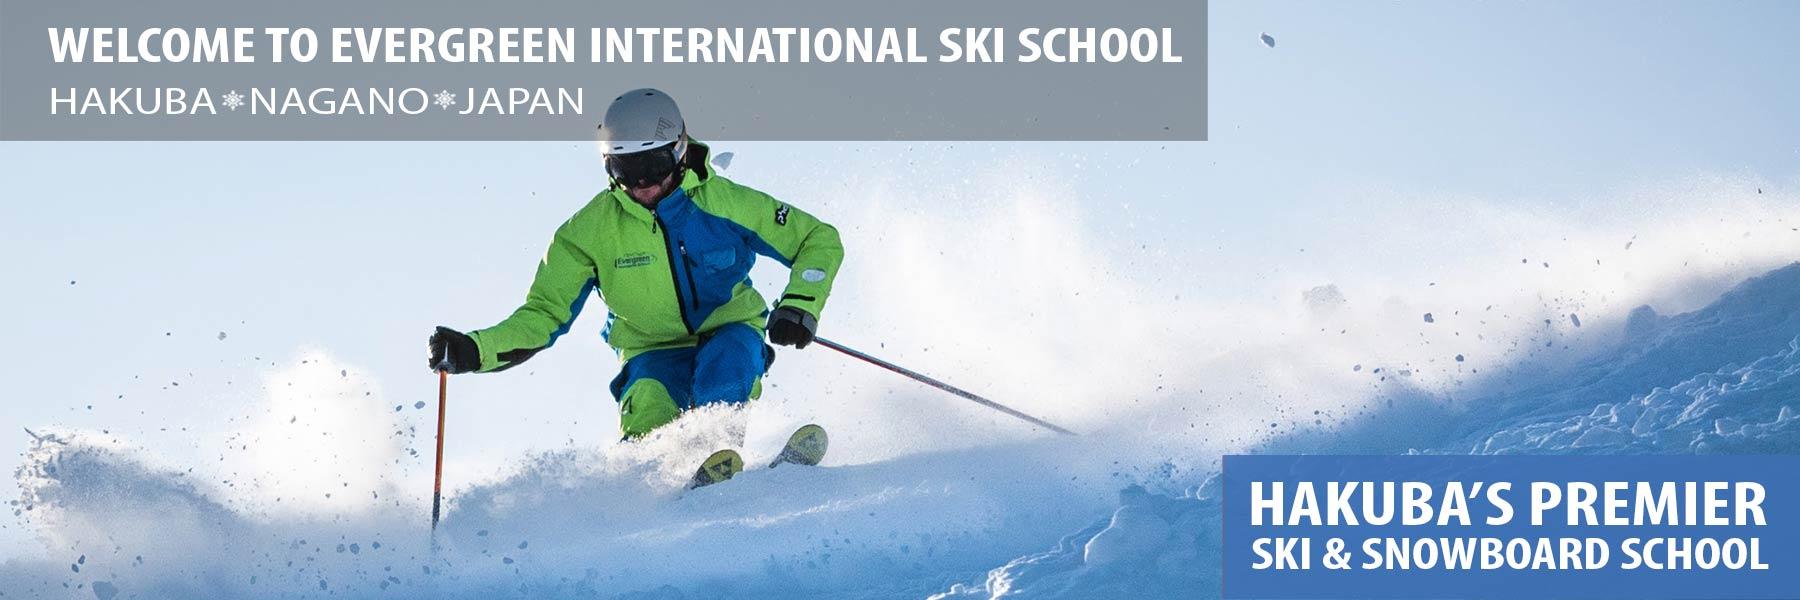 hakuba ski school header - powder skiing in japan